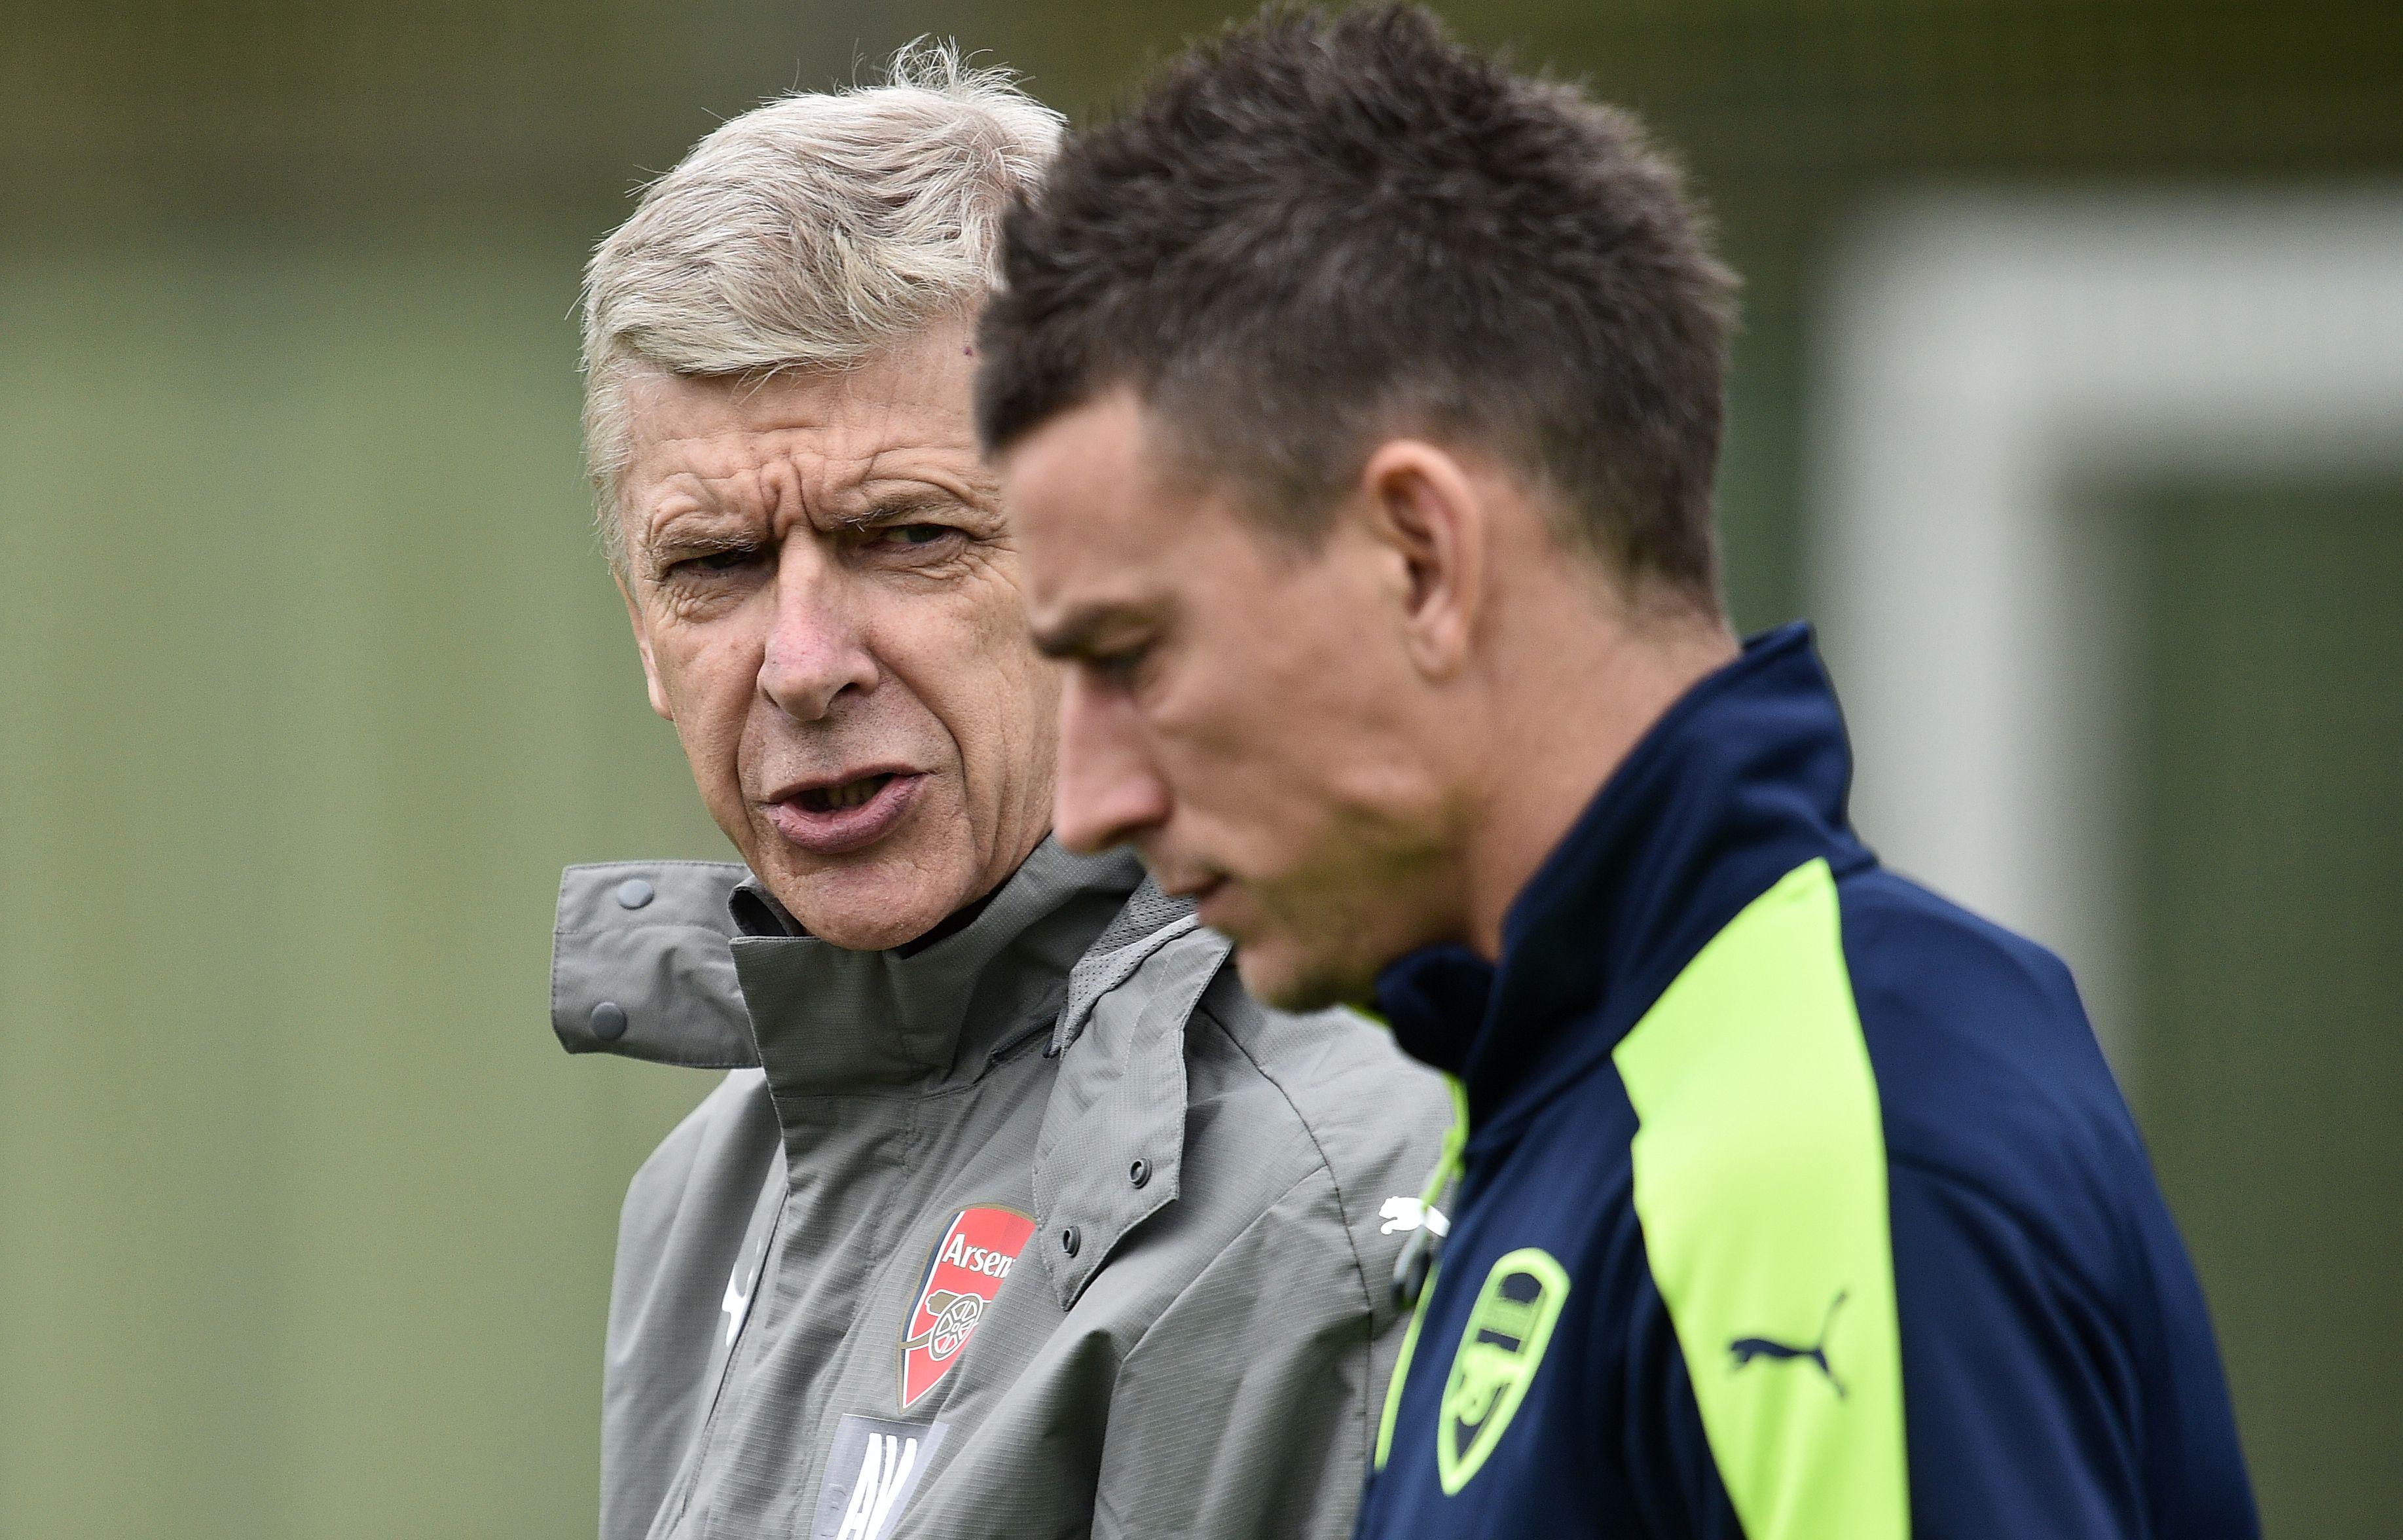 Rio Ferdinand explains why Arsenal have a key advantage in the Premier League title race